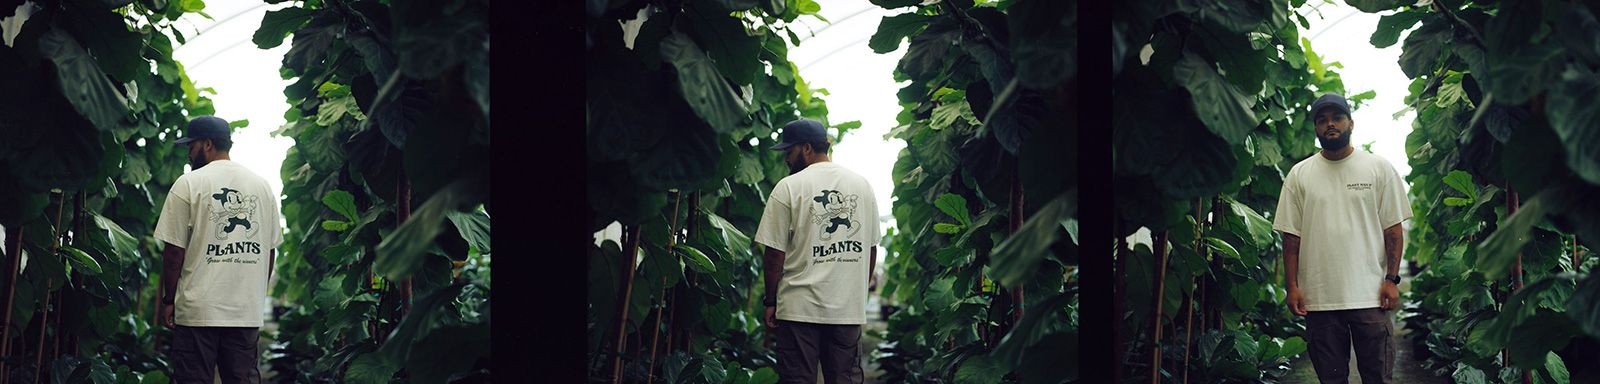 plant-man-p-hm-blank-staples-new-04